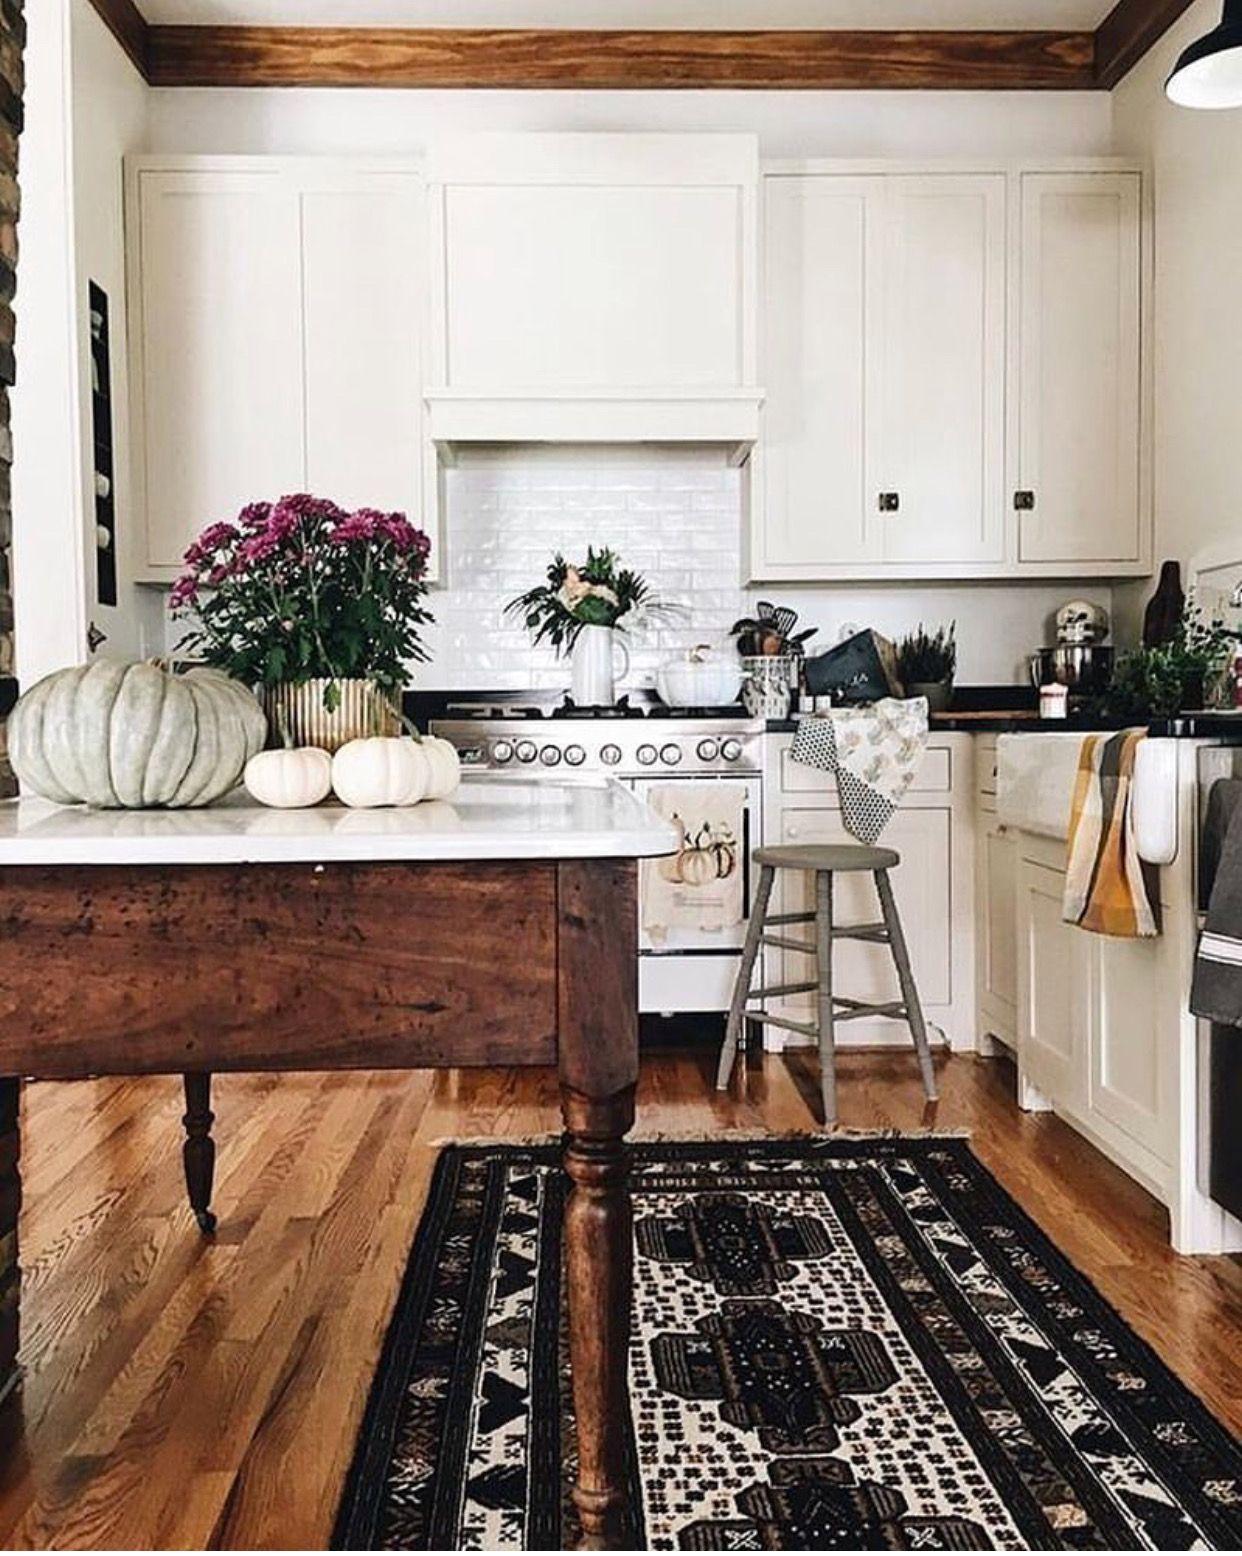 Hardwood Floor Oriental Rug Stand Alone Tabletop Farmhouse Kitchen Design Sweet Home Interior Design Kitchen Rug in kitchen with hardwood floor